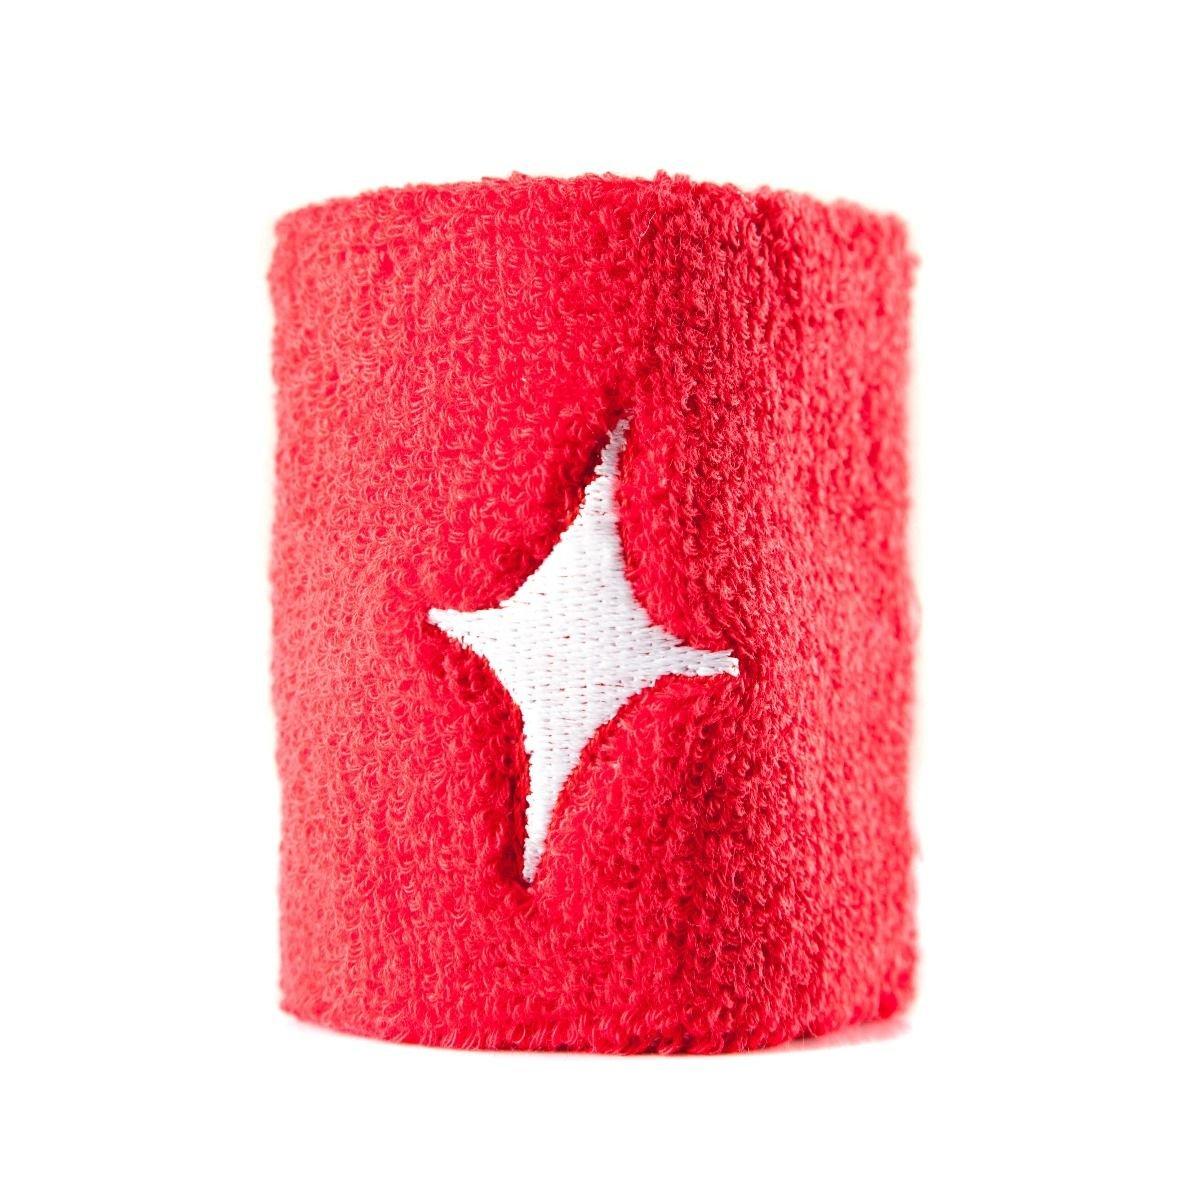 Star vie - Muñequera Roja Starvie-Pack De 2: Amazon.es: Deportes y ...